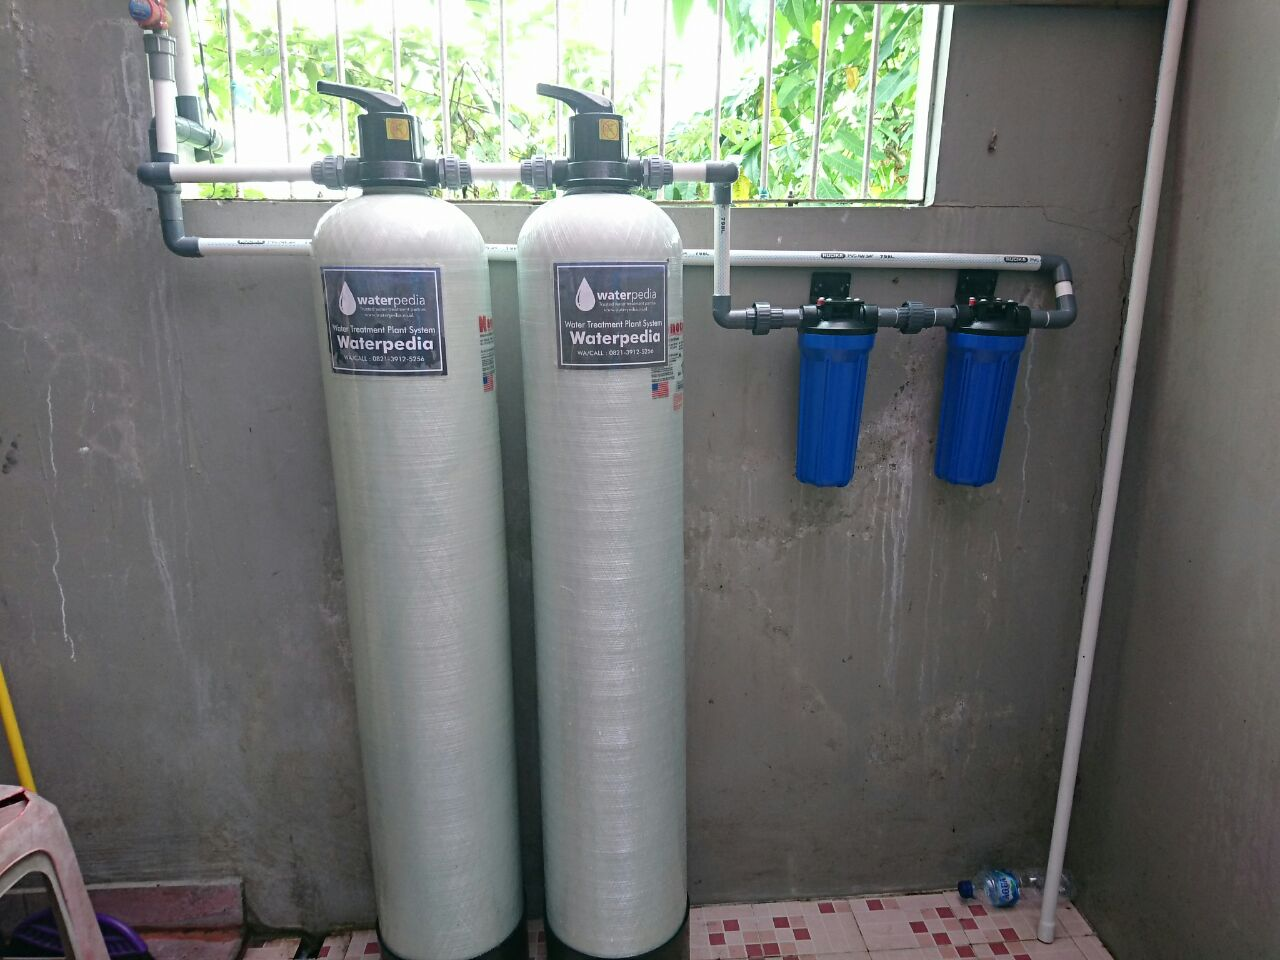 Filter Air Rumah Tangga Untuk Menghilangkan Bau Besi